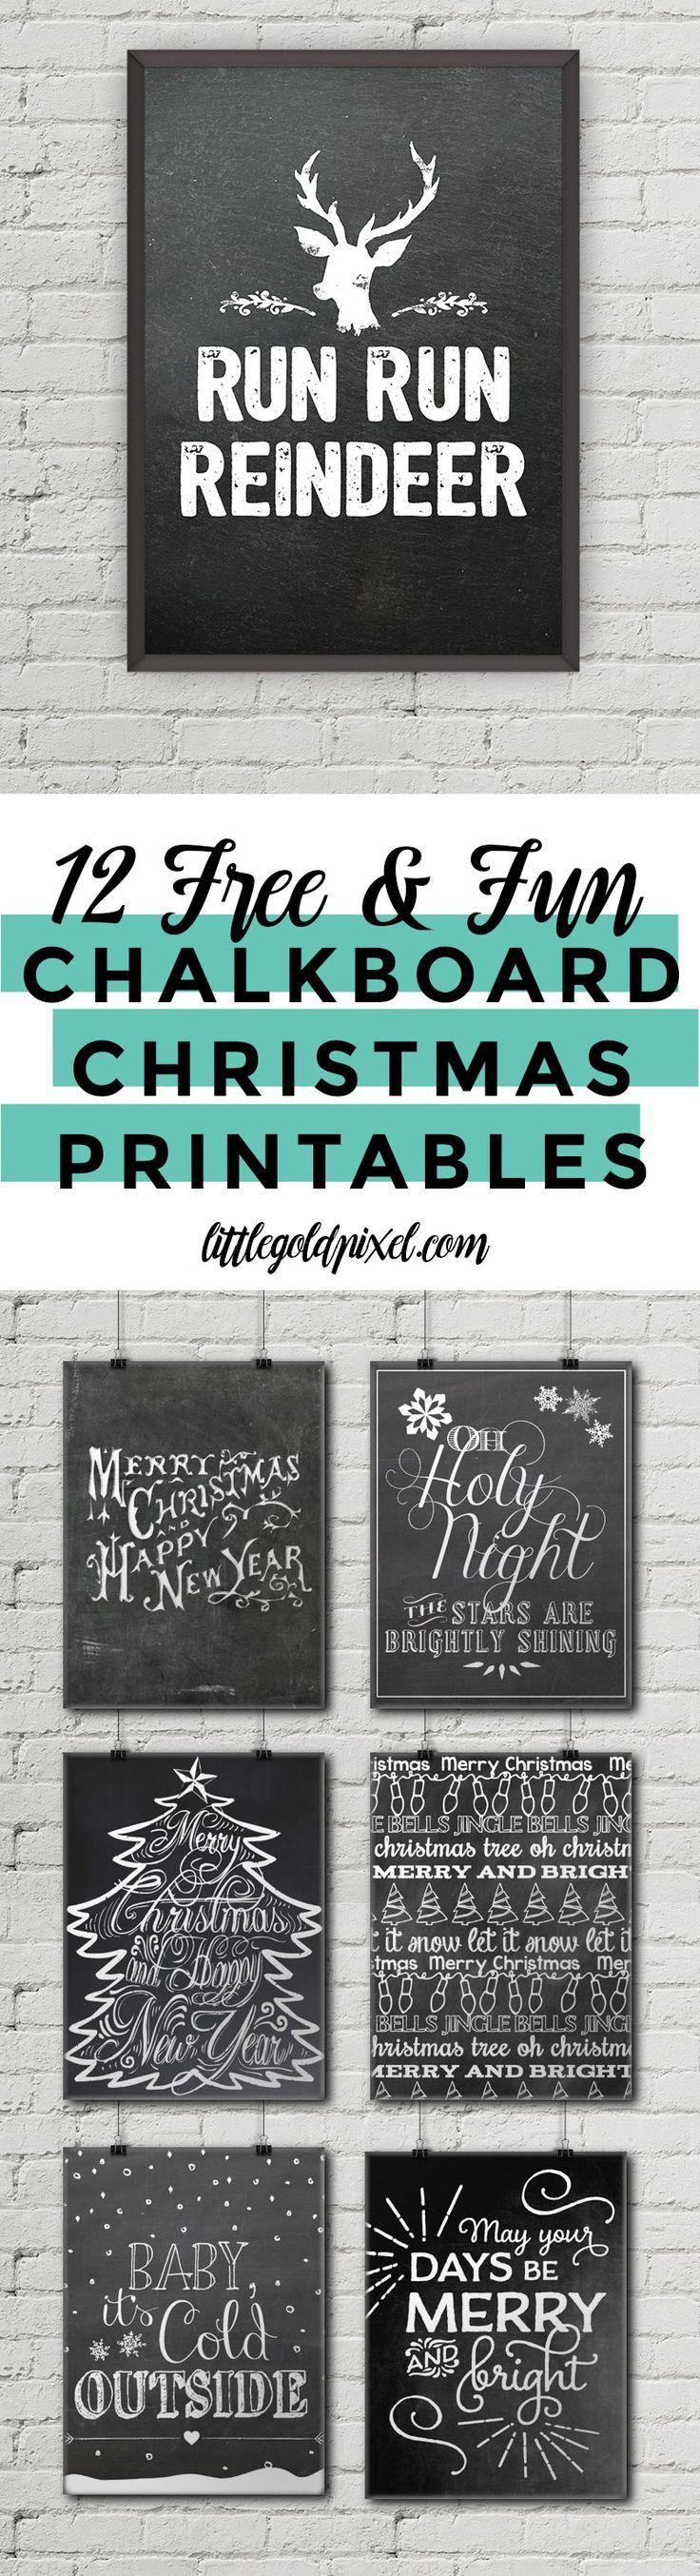 50+ best Holiday Decorating Inspiration images on Pinterest ...